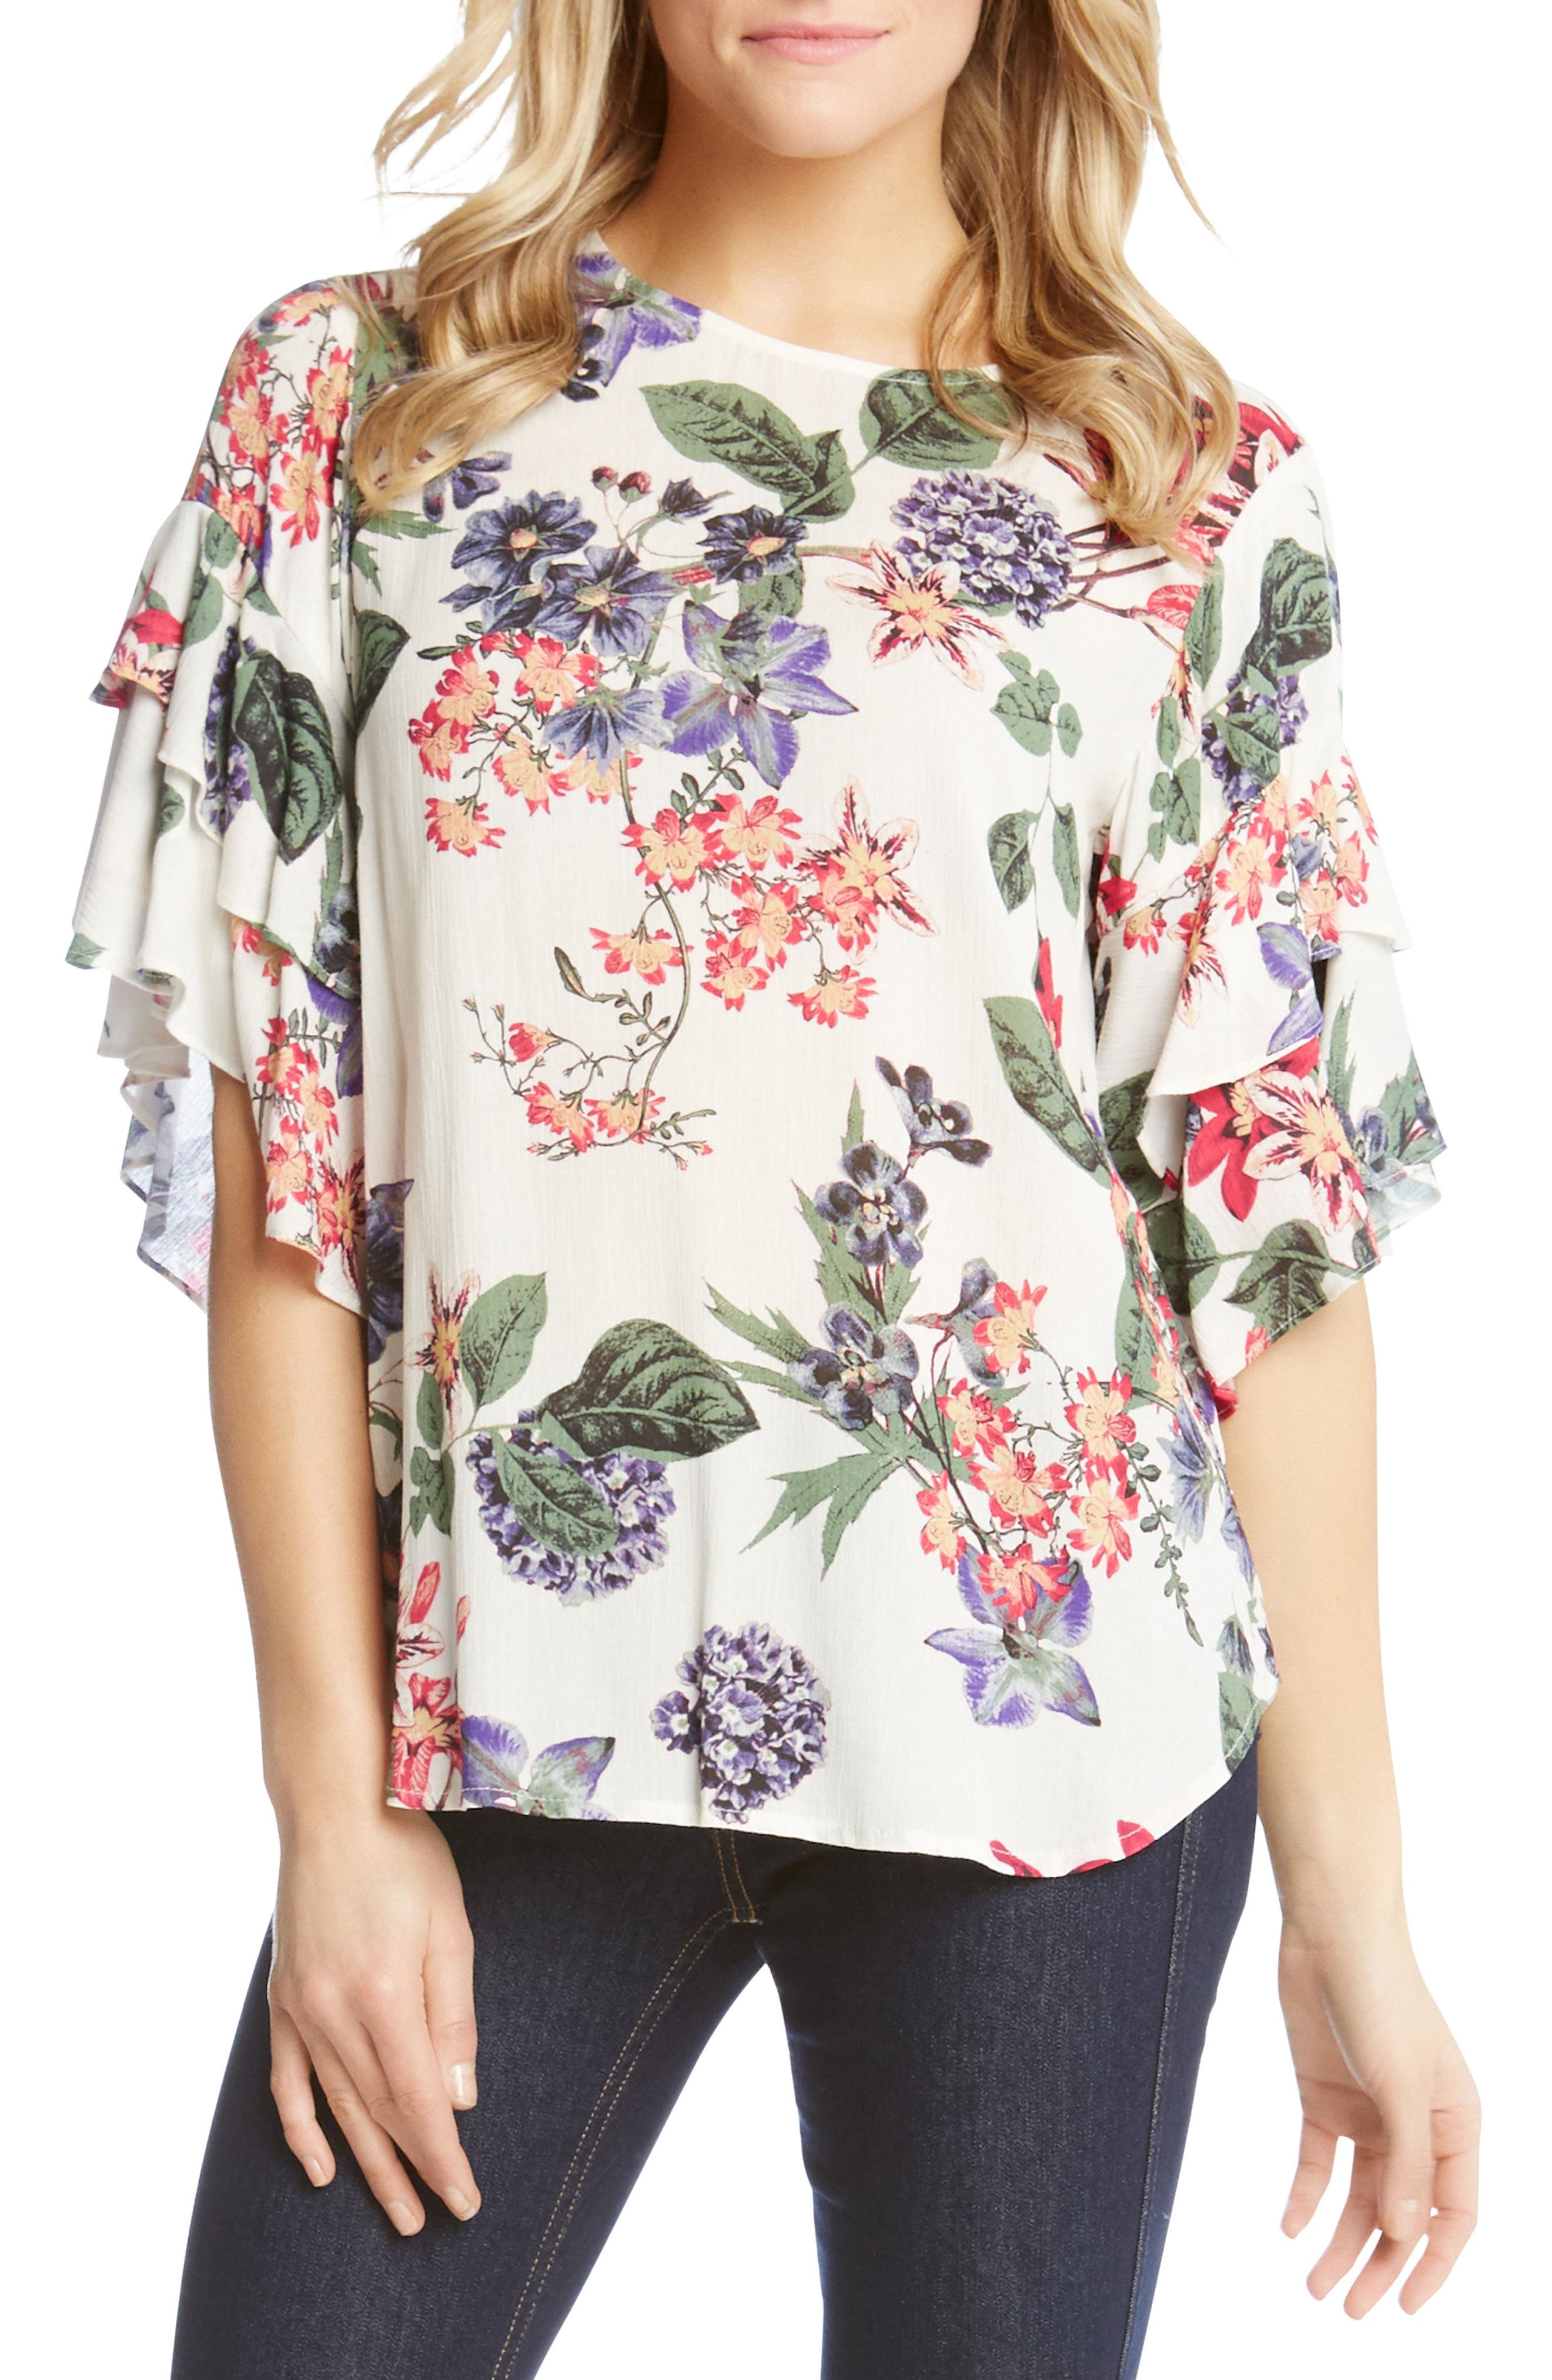 Ruffle Sleeve Floral Top,                             Main thumbnail 1, color,                             160